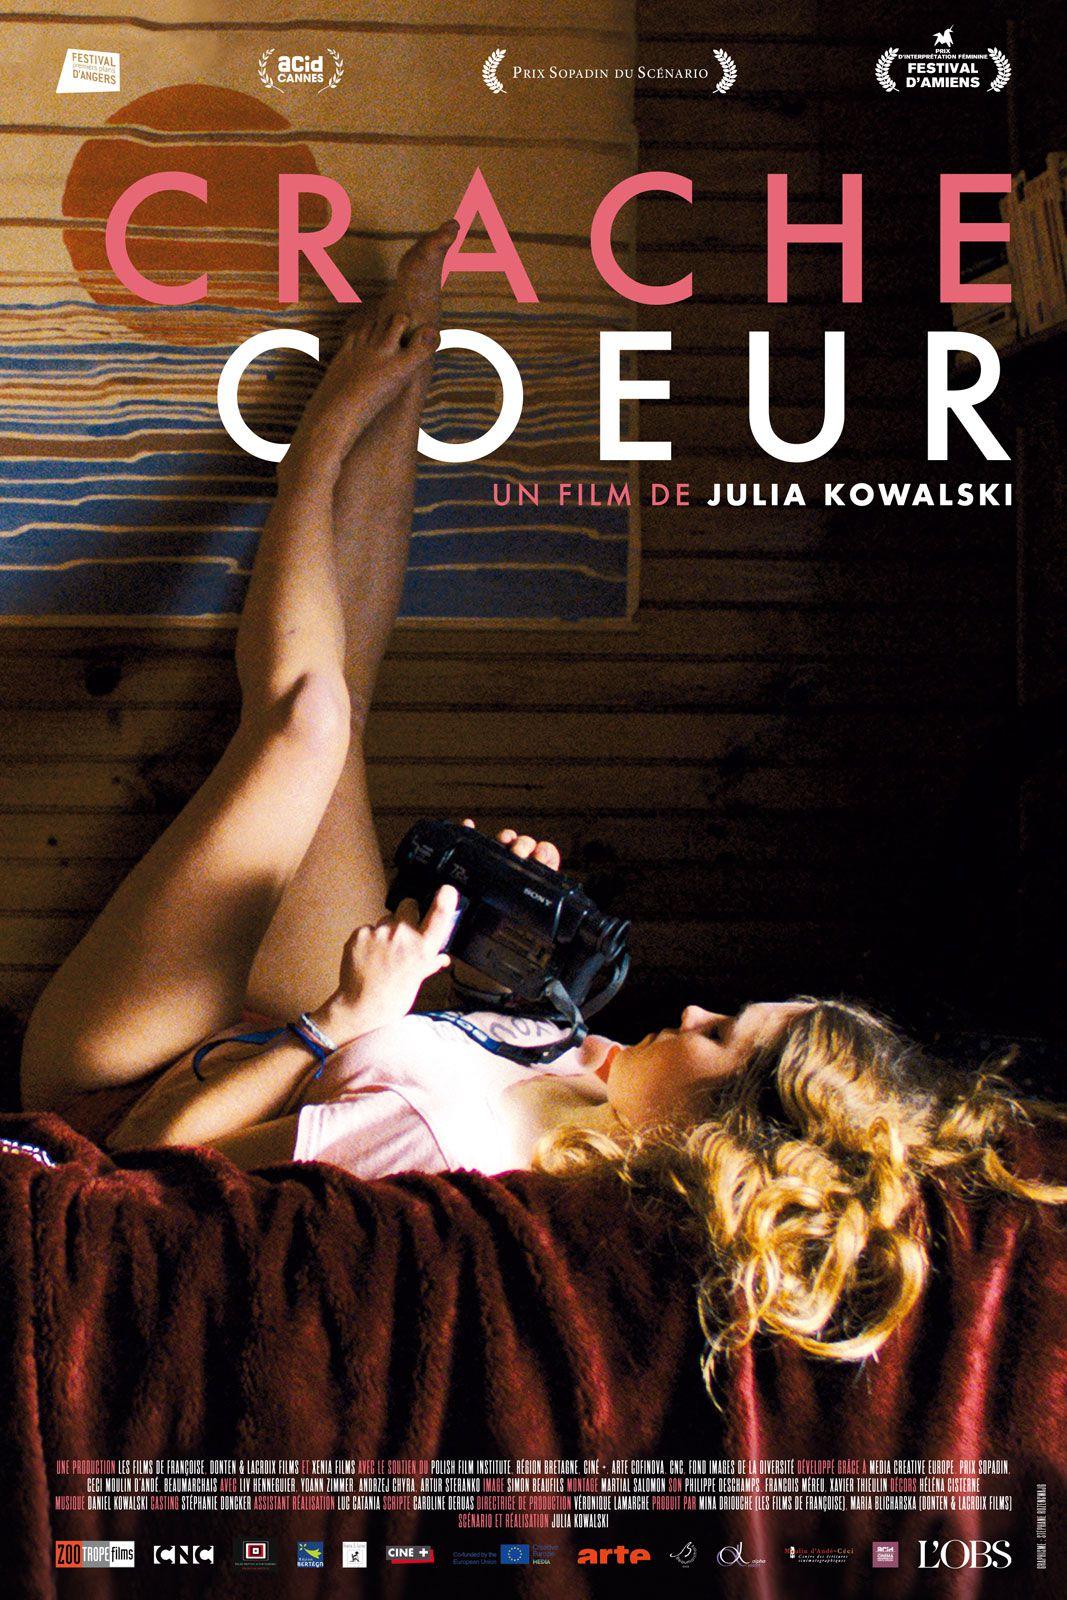 Crache coeur - Film (2016)